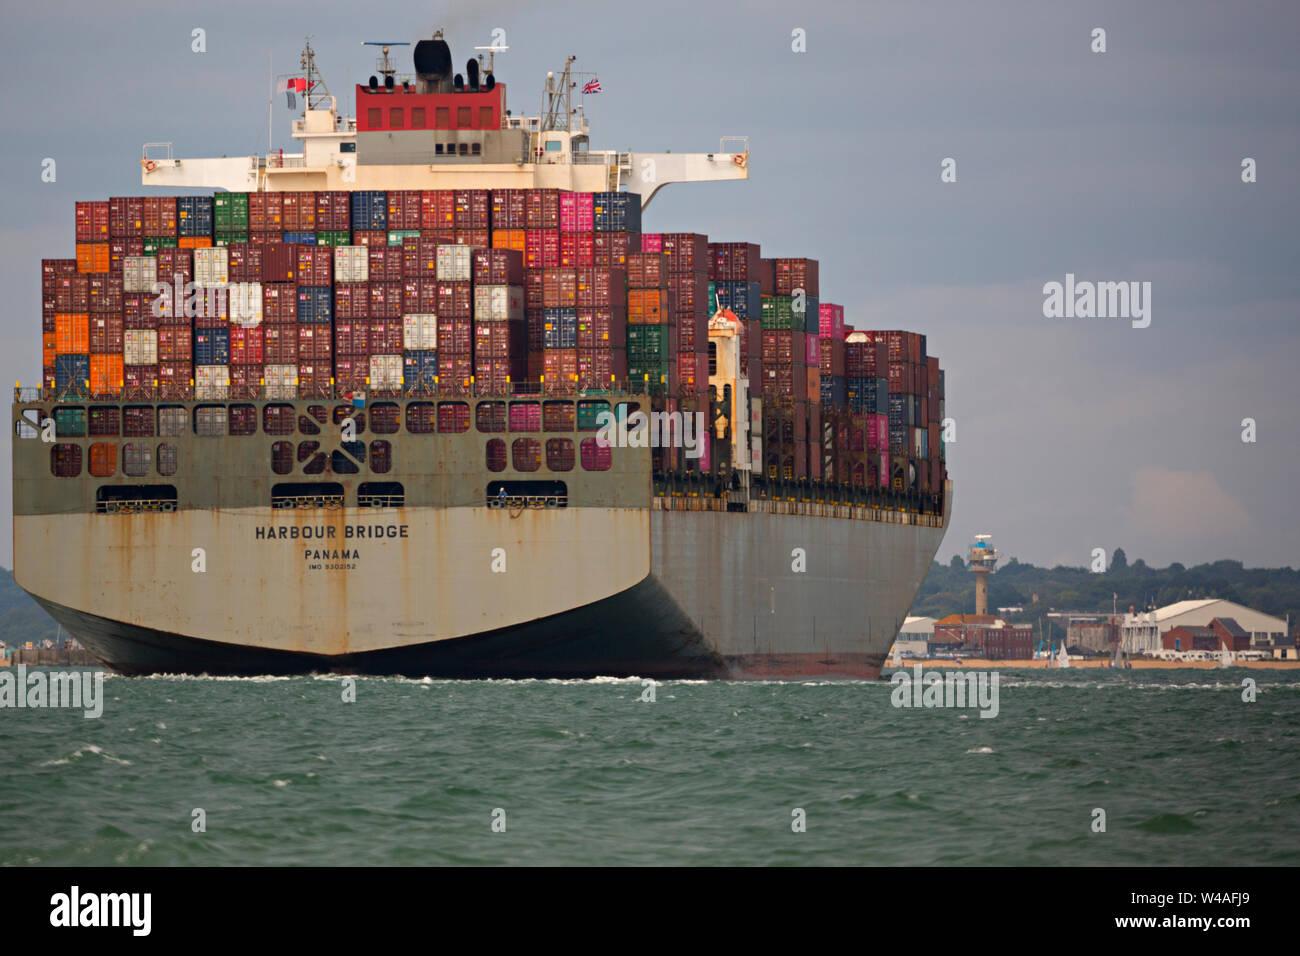 Ship,Harbour Bridge,,Panama, Container,Ship,Southampton,Terminal,The Solent,China,Europe,import,trade, Stock Photo